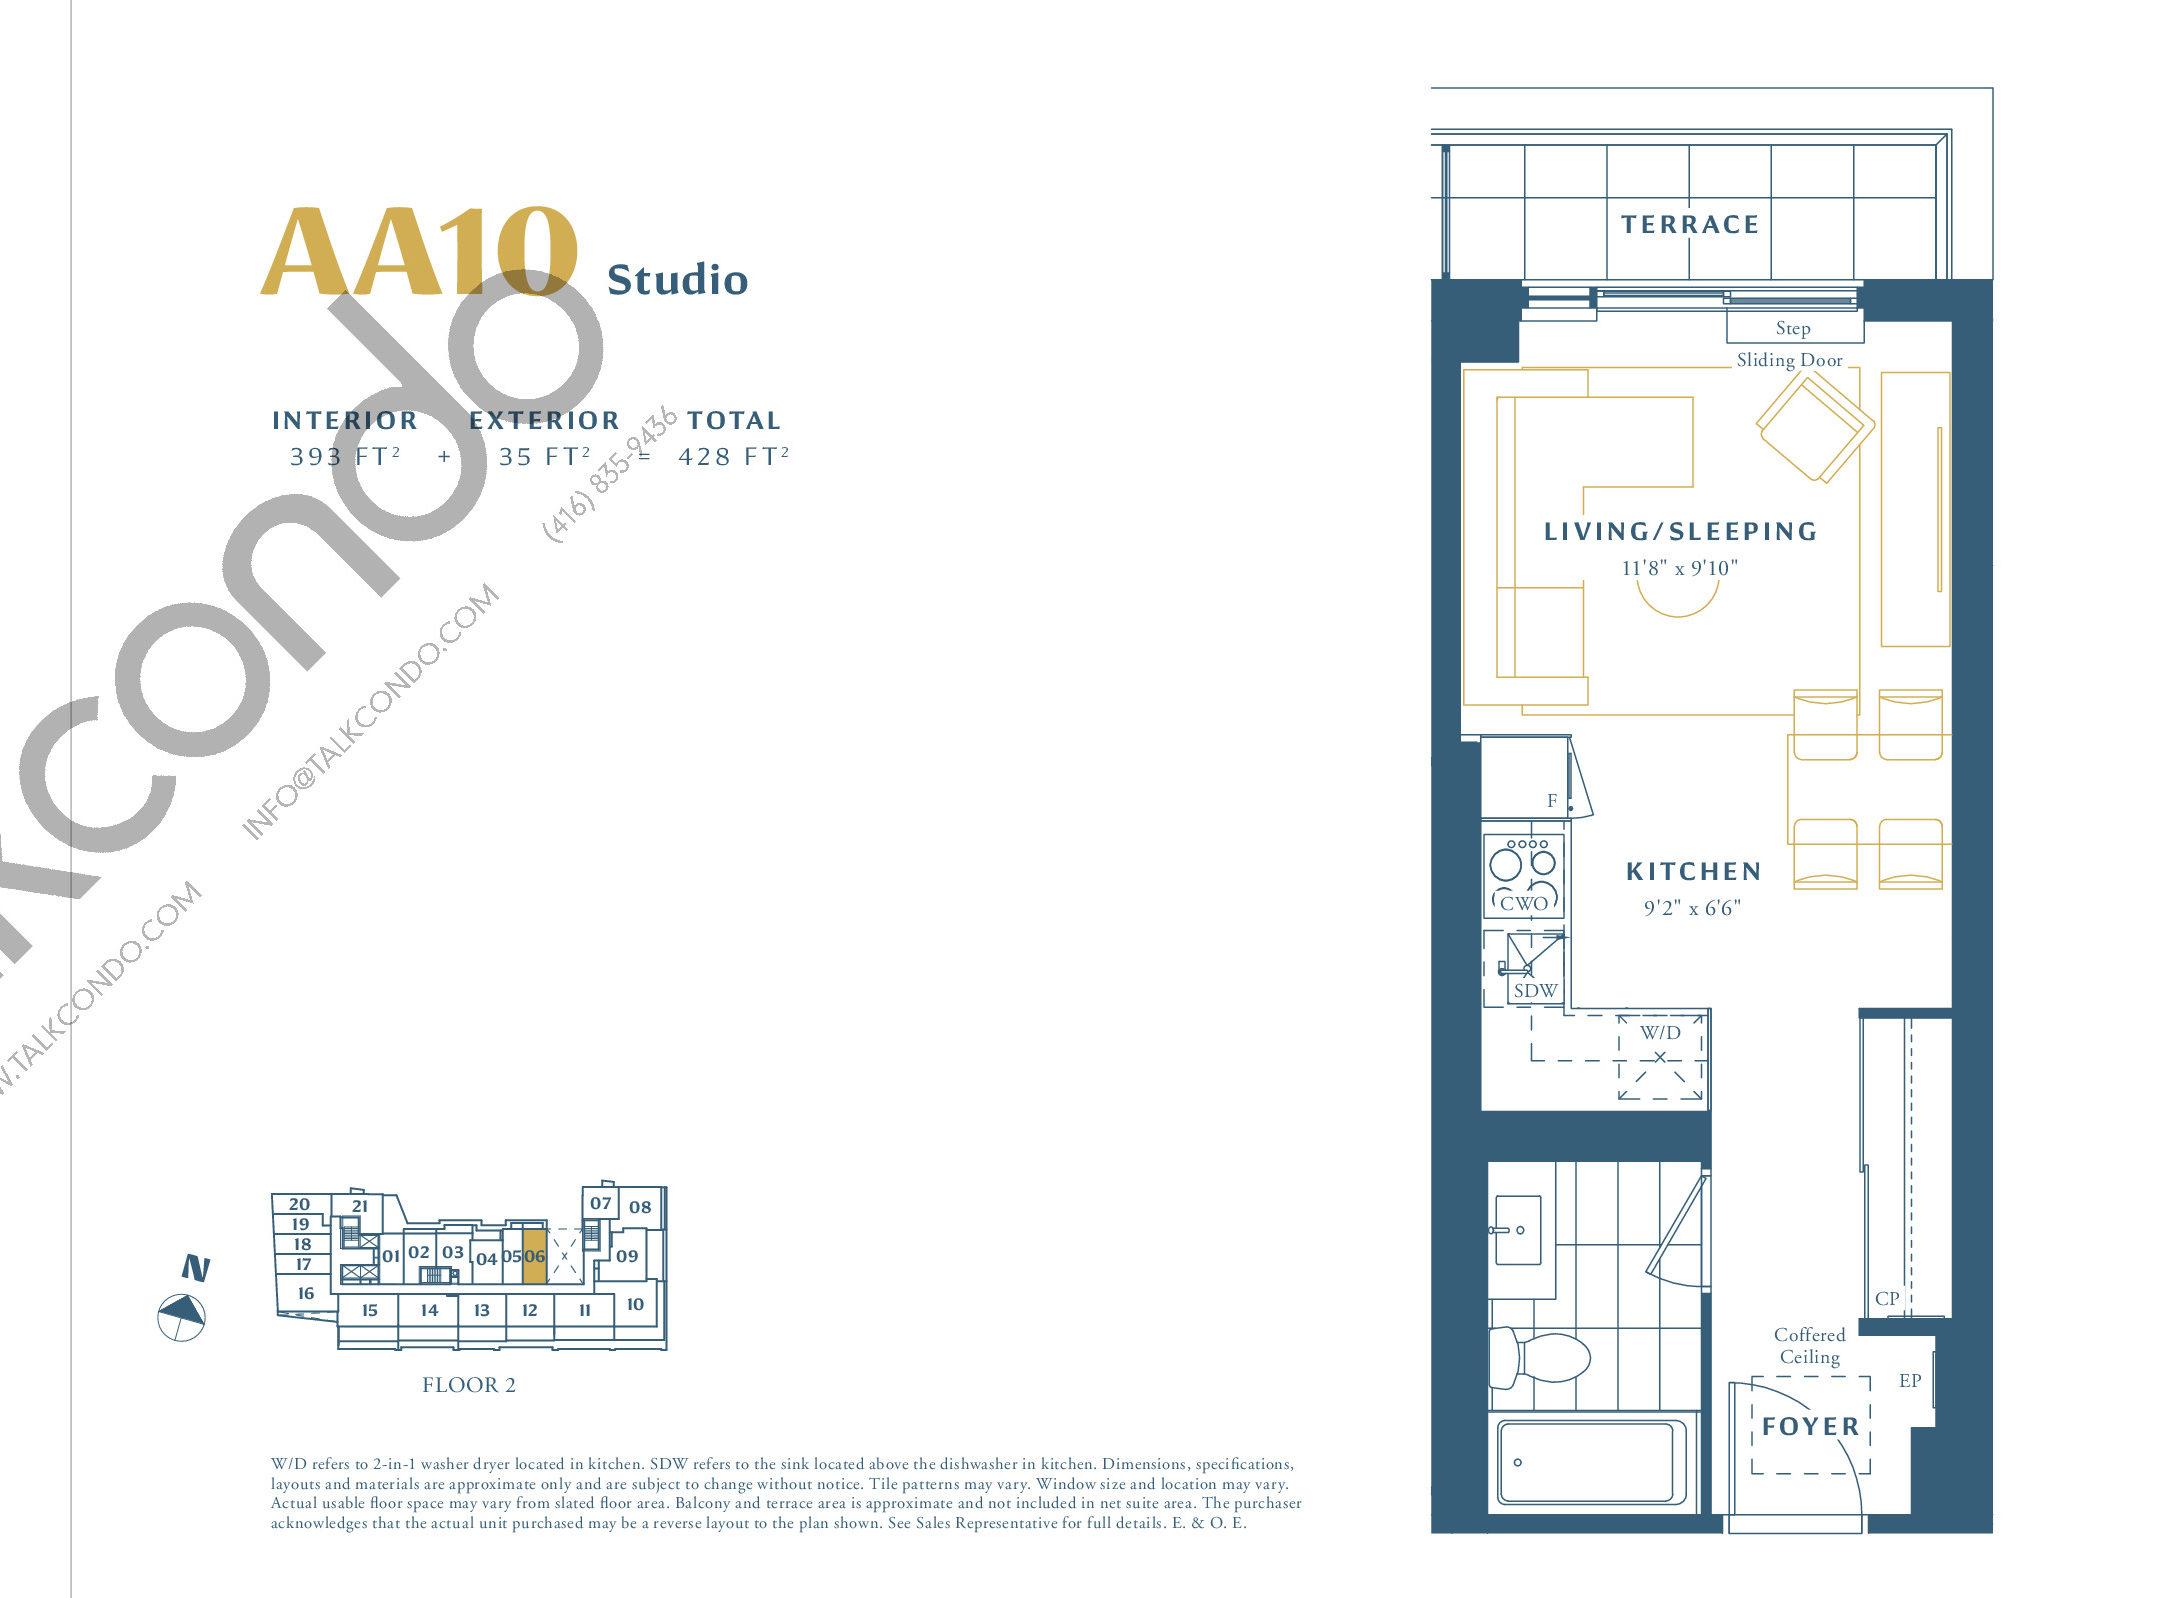 AA10 Floor Plan at The Borough Condos - Tower A - 393 sq.ft